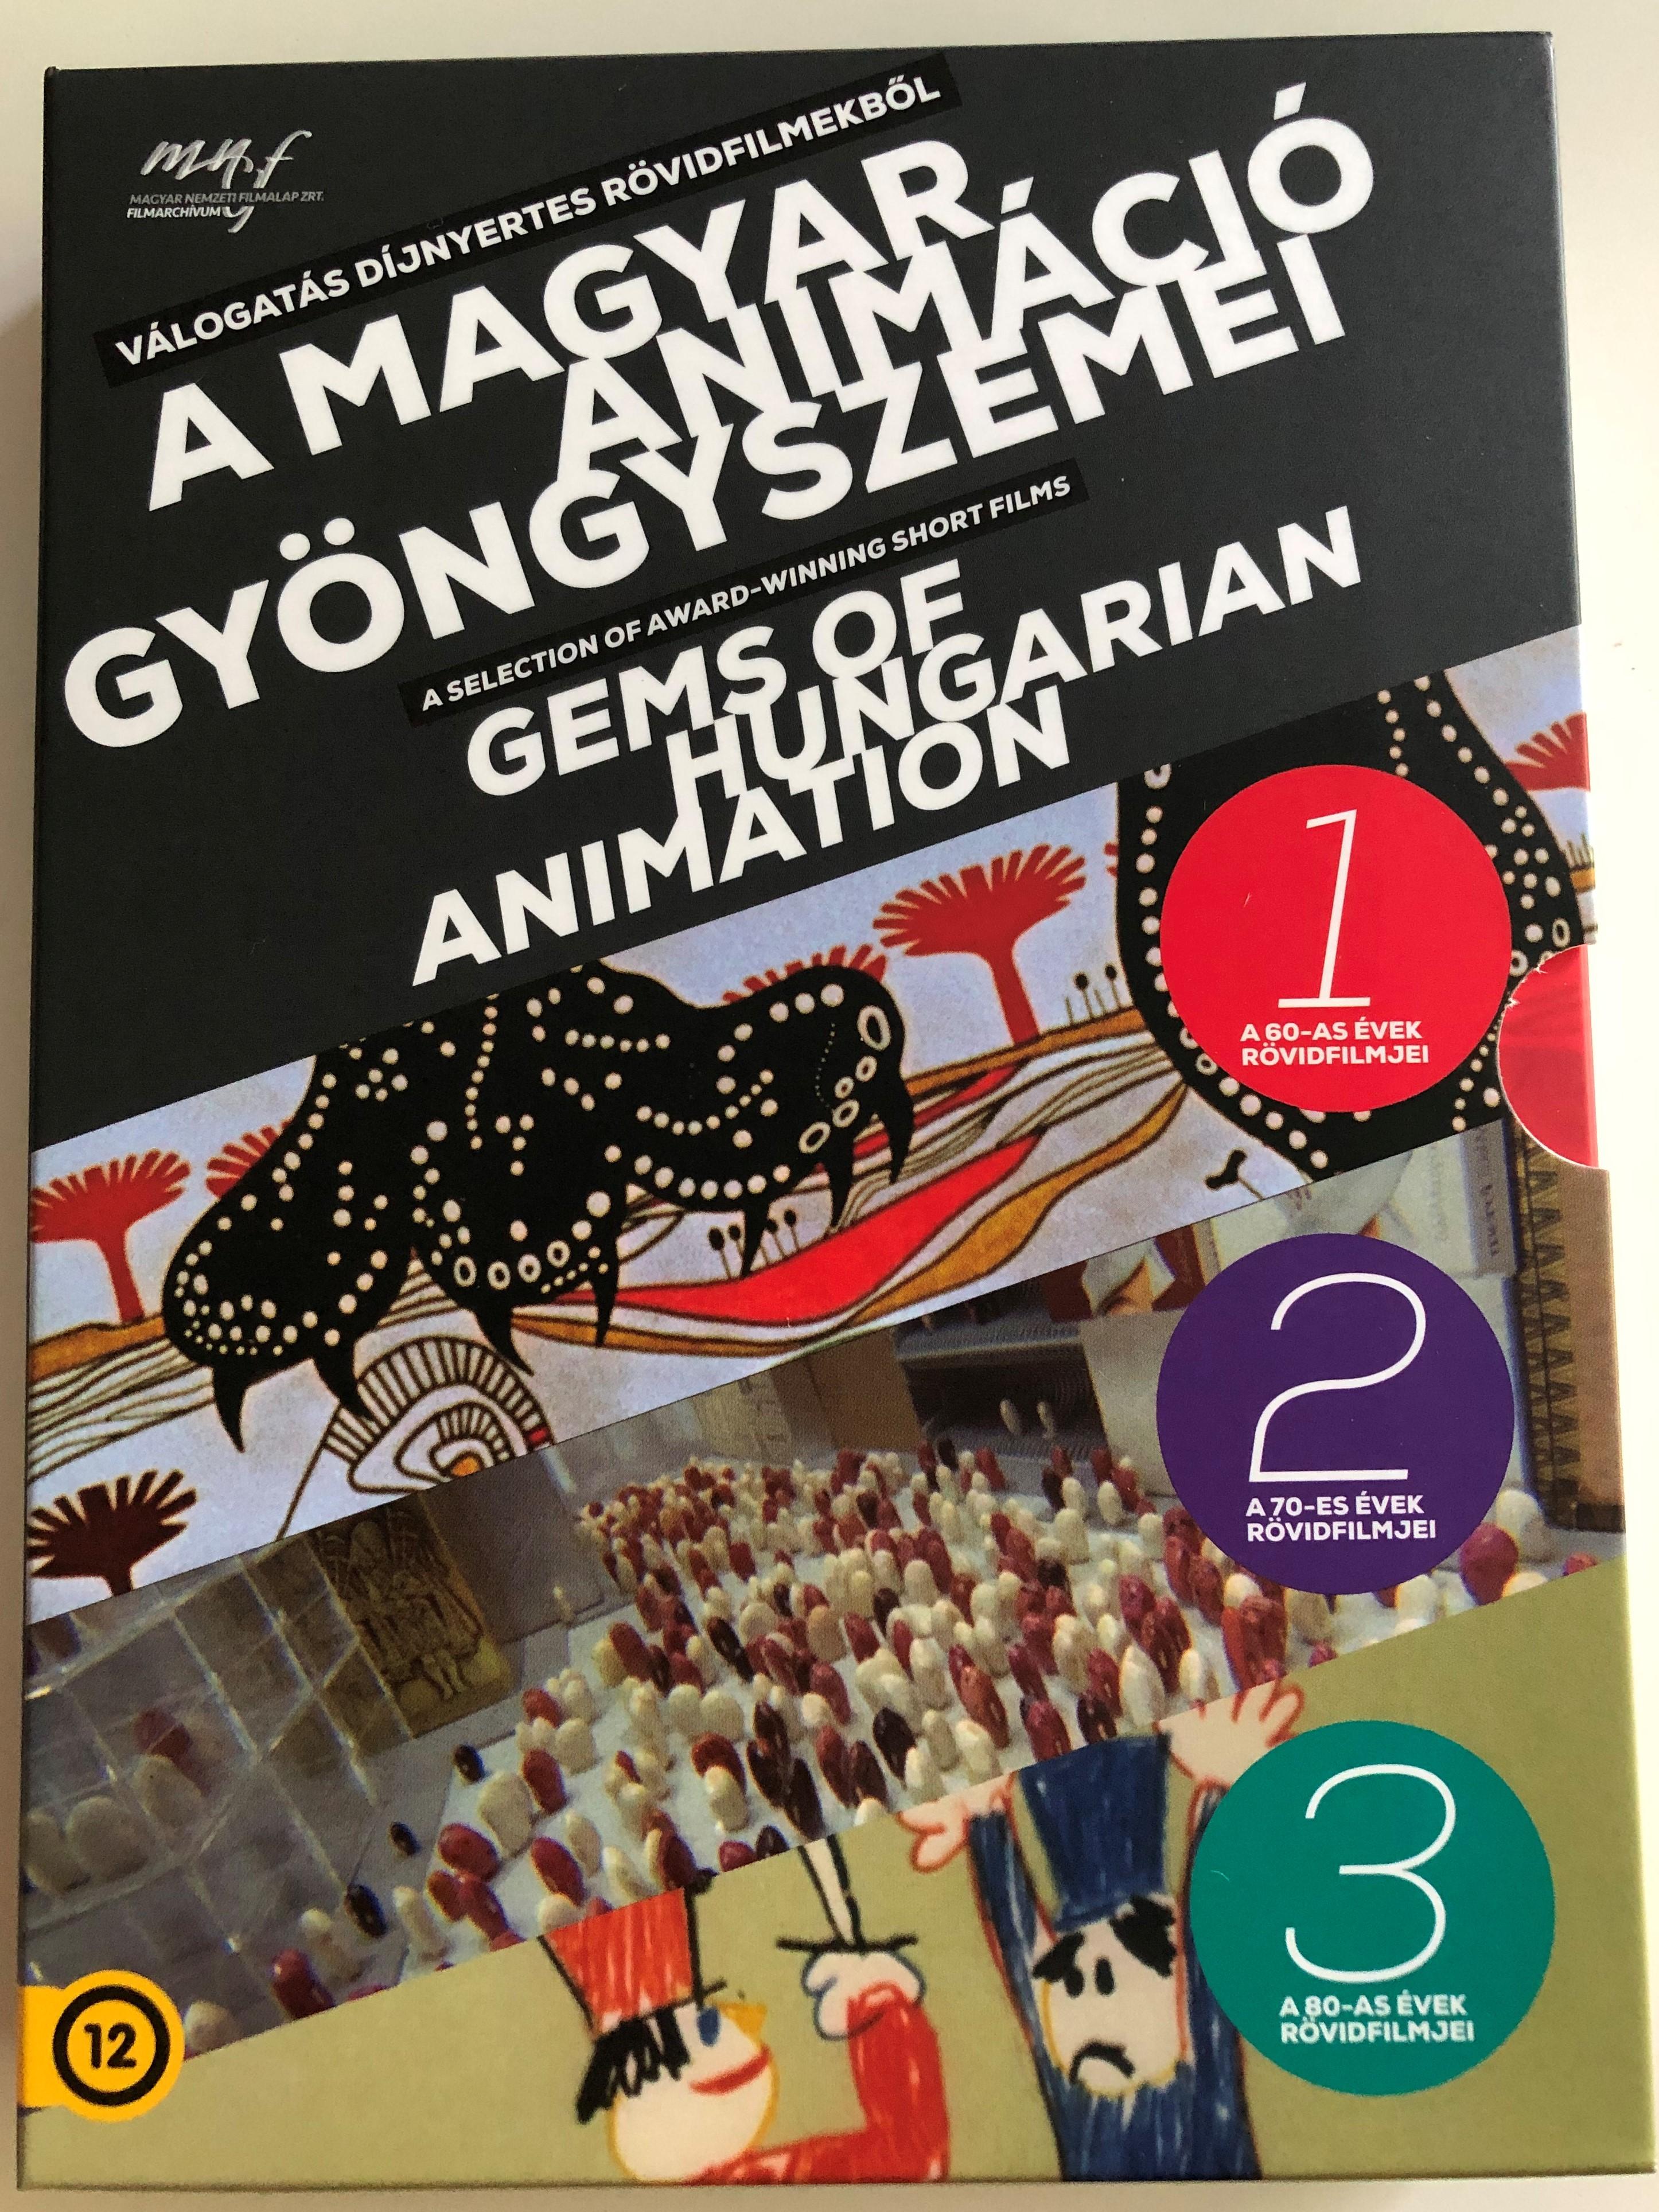 gems-of-hungarian-animation-vol-1-3.-dvd-2019-a-magyar-anim-ci-gy-ngyszemei-vol-1.-3.-3-dvd-set-1-.jpg